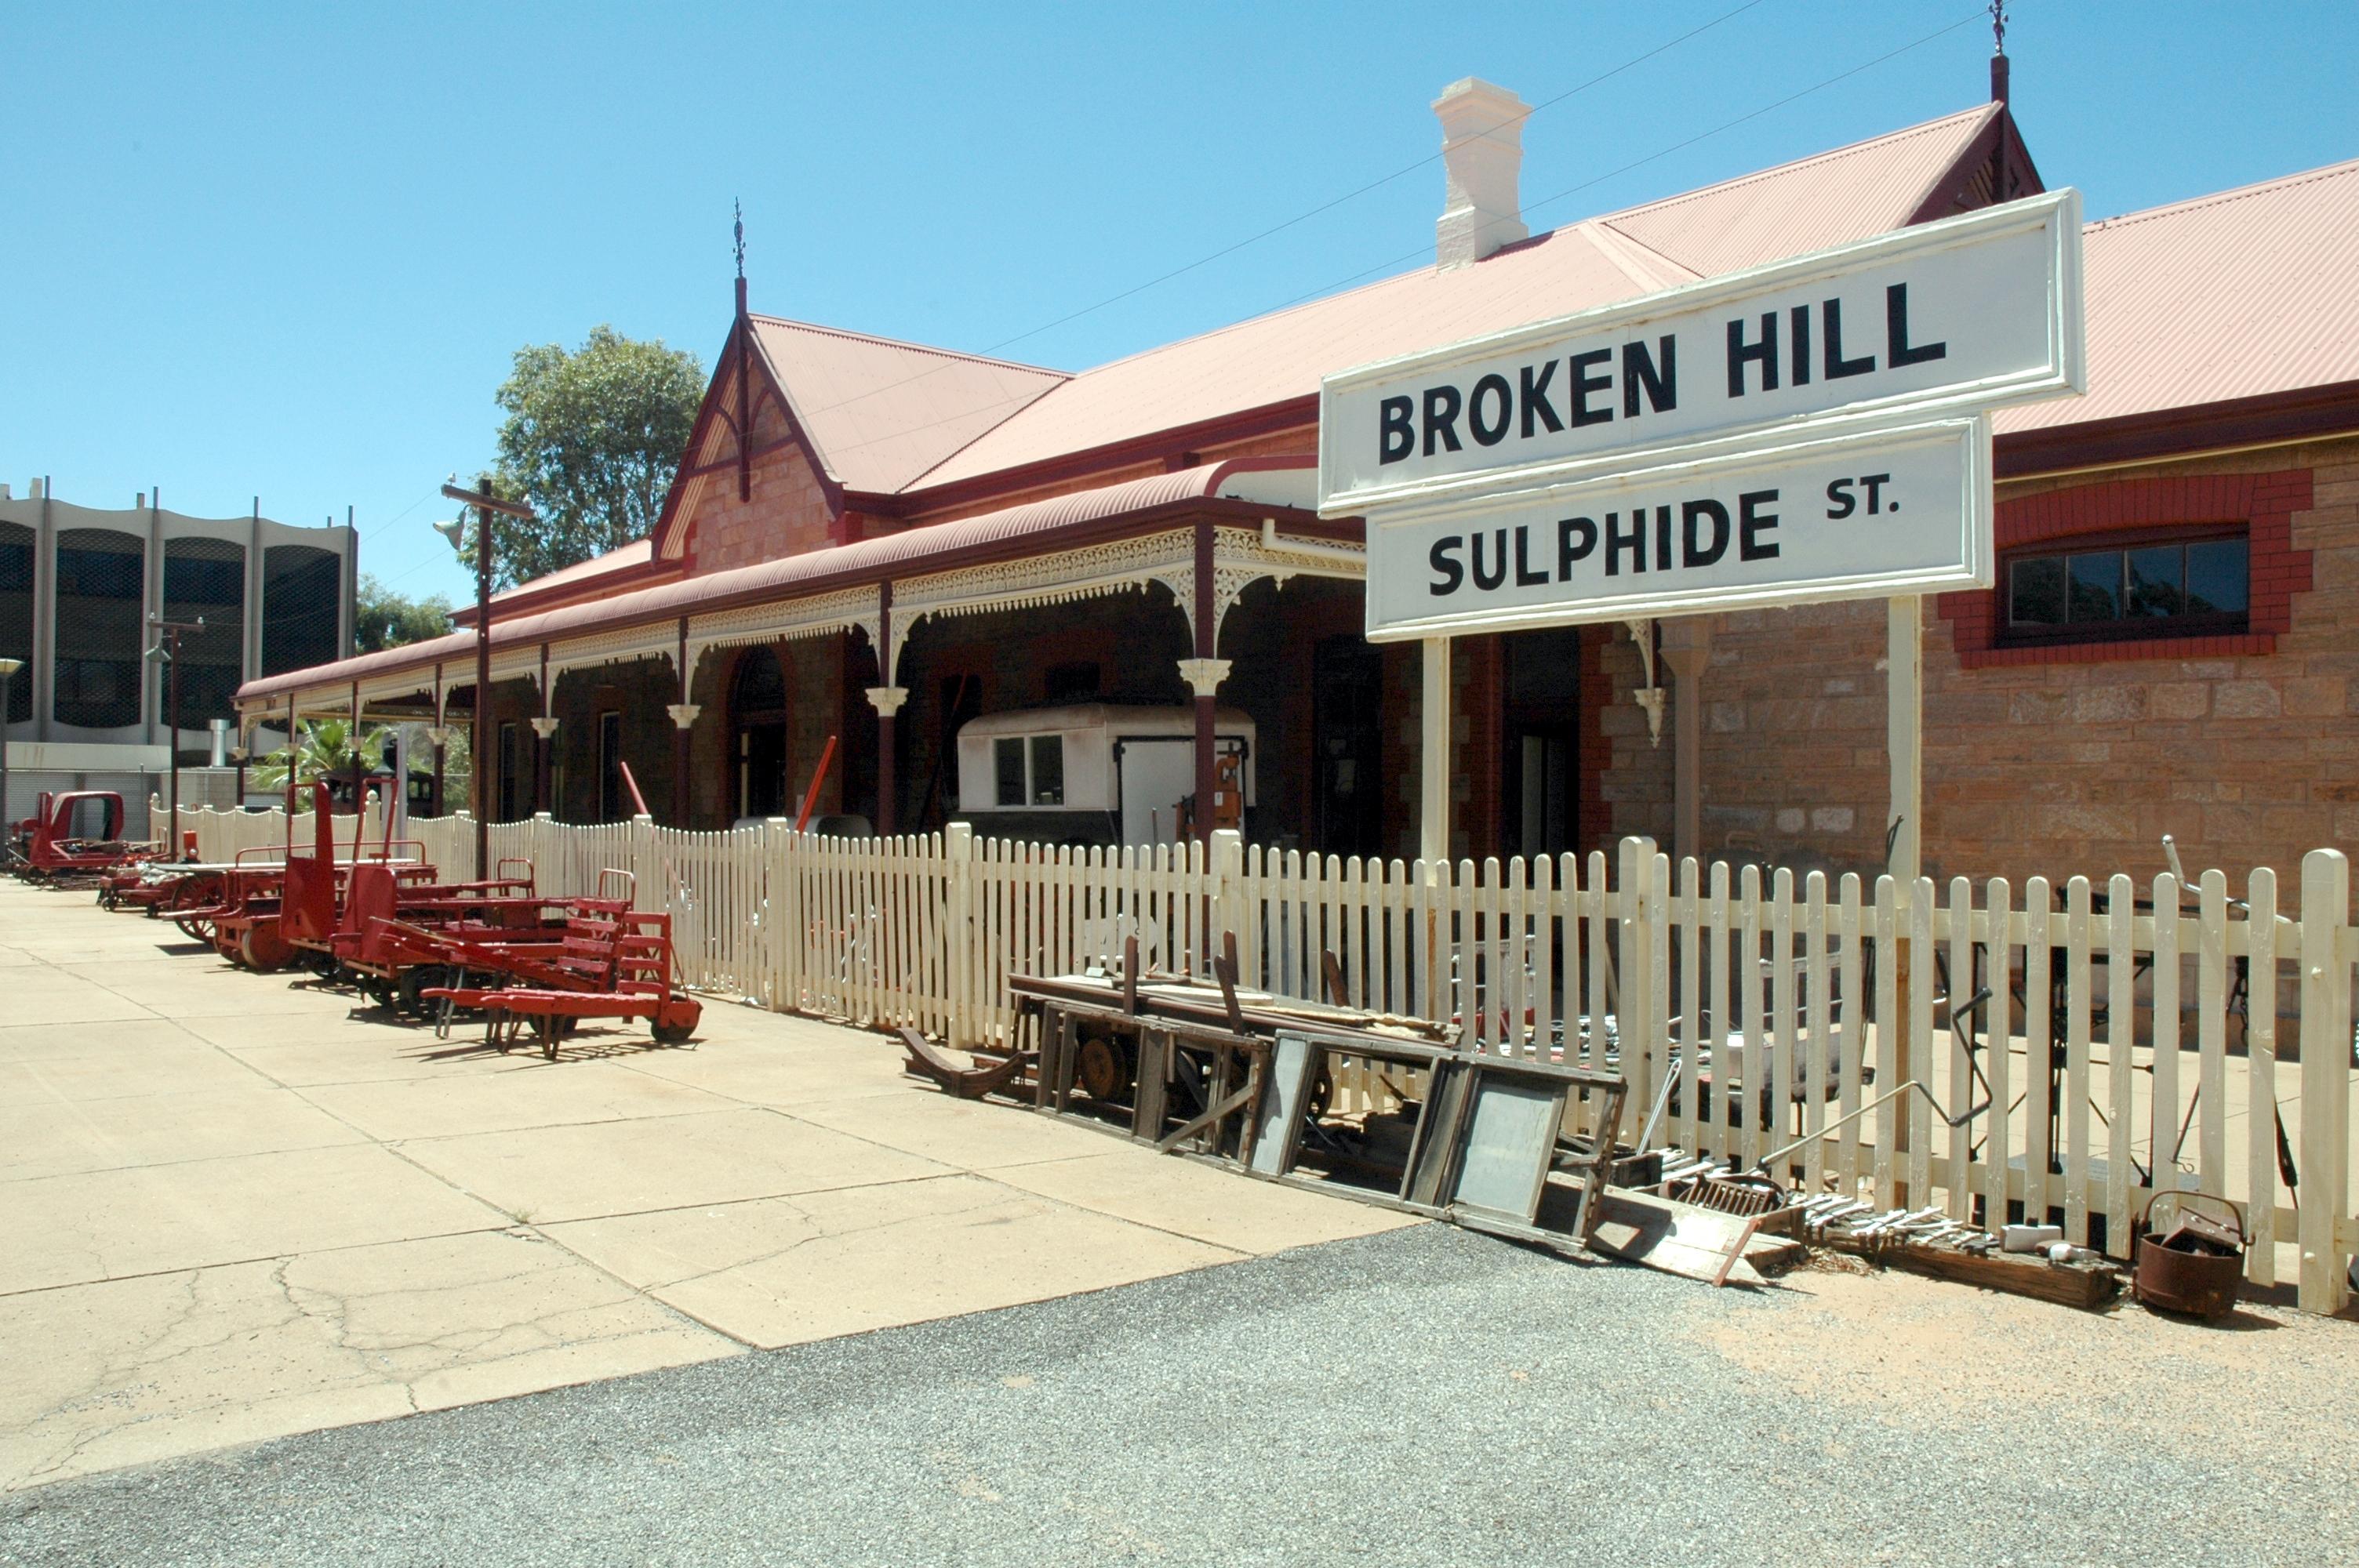 Sulphide Street Railway Station